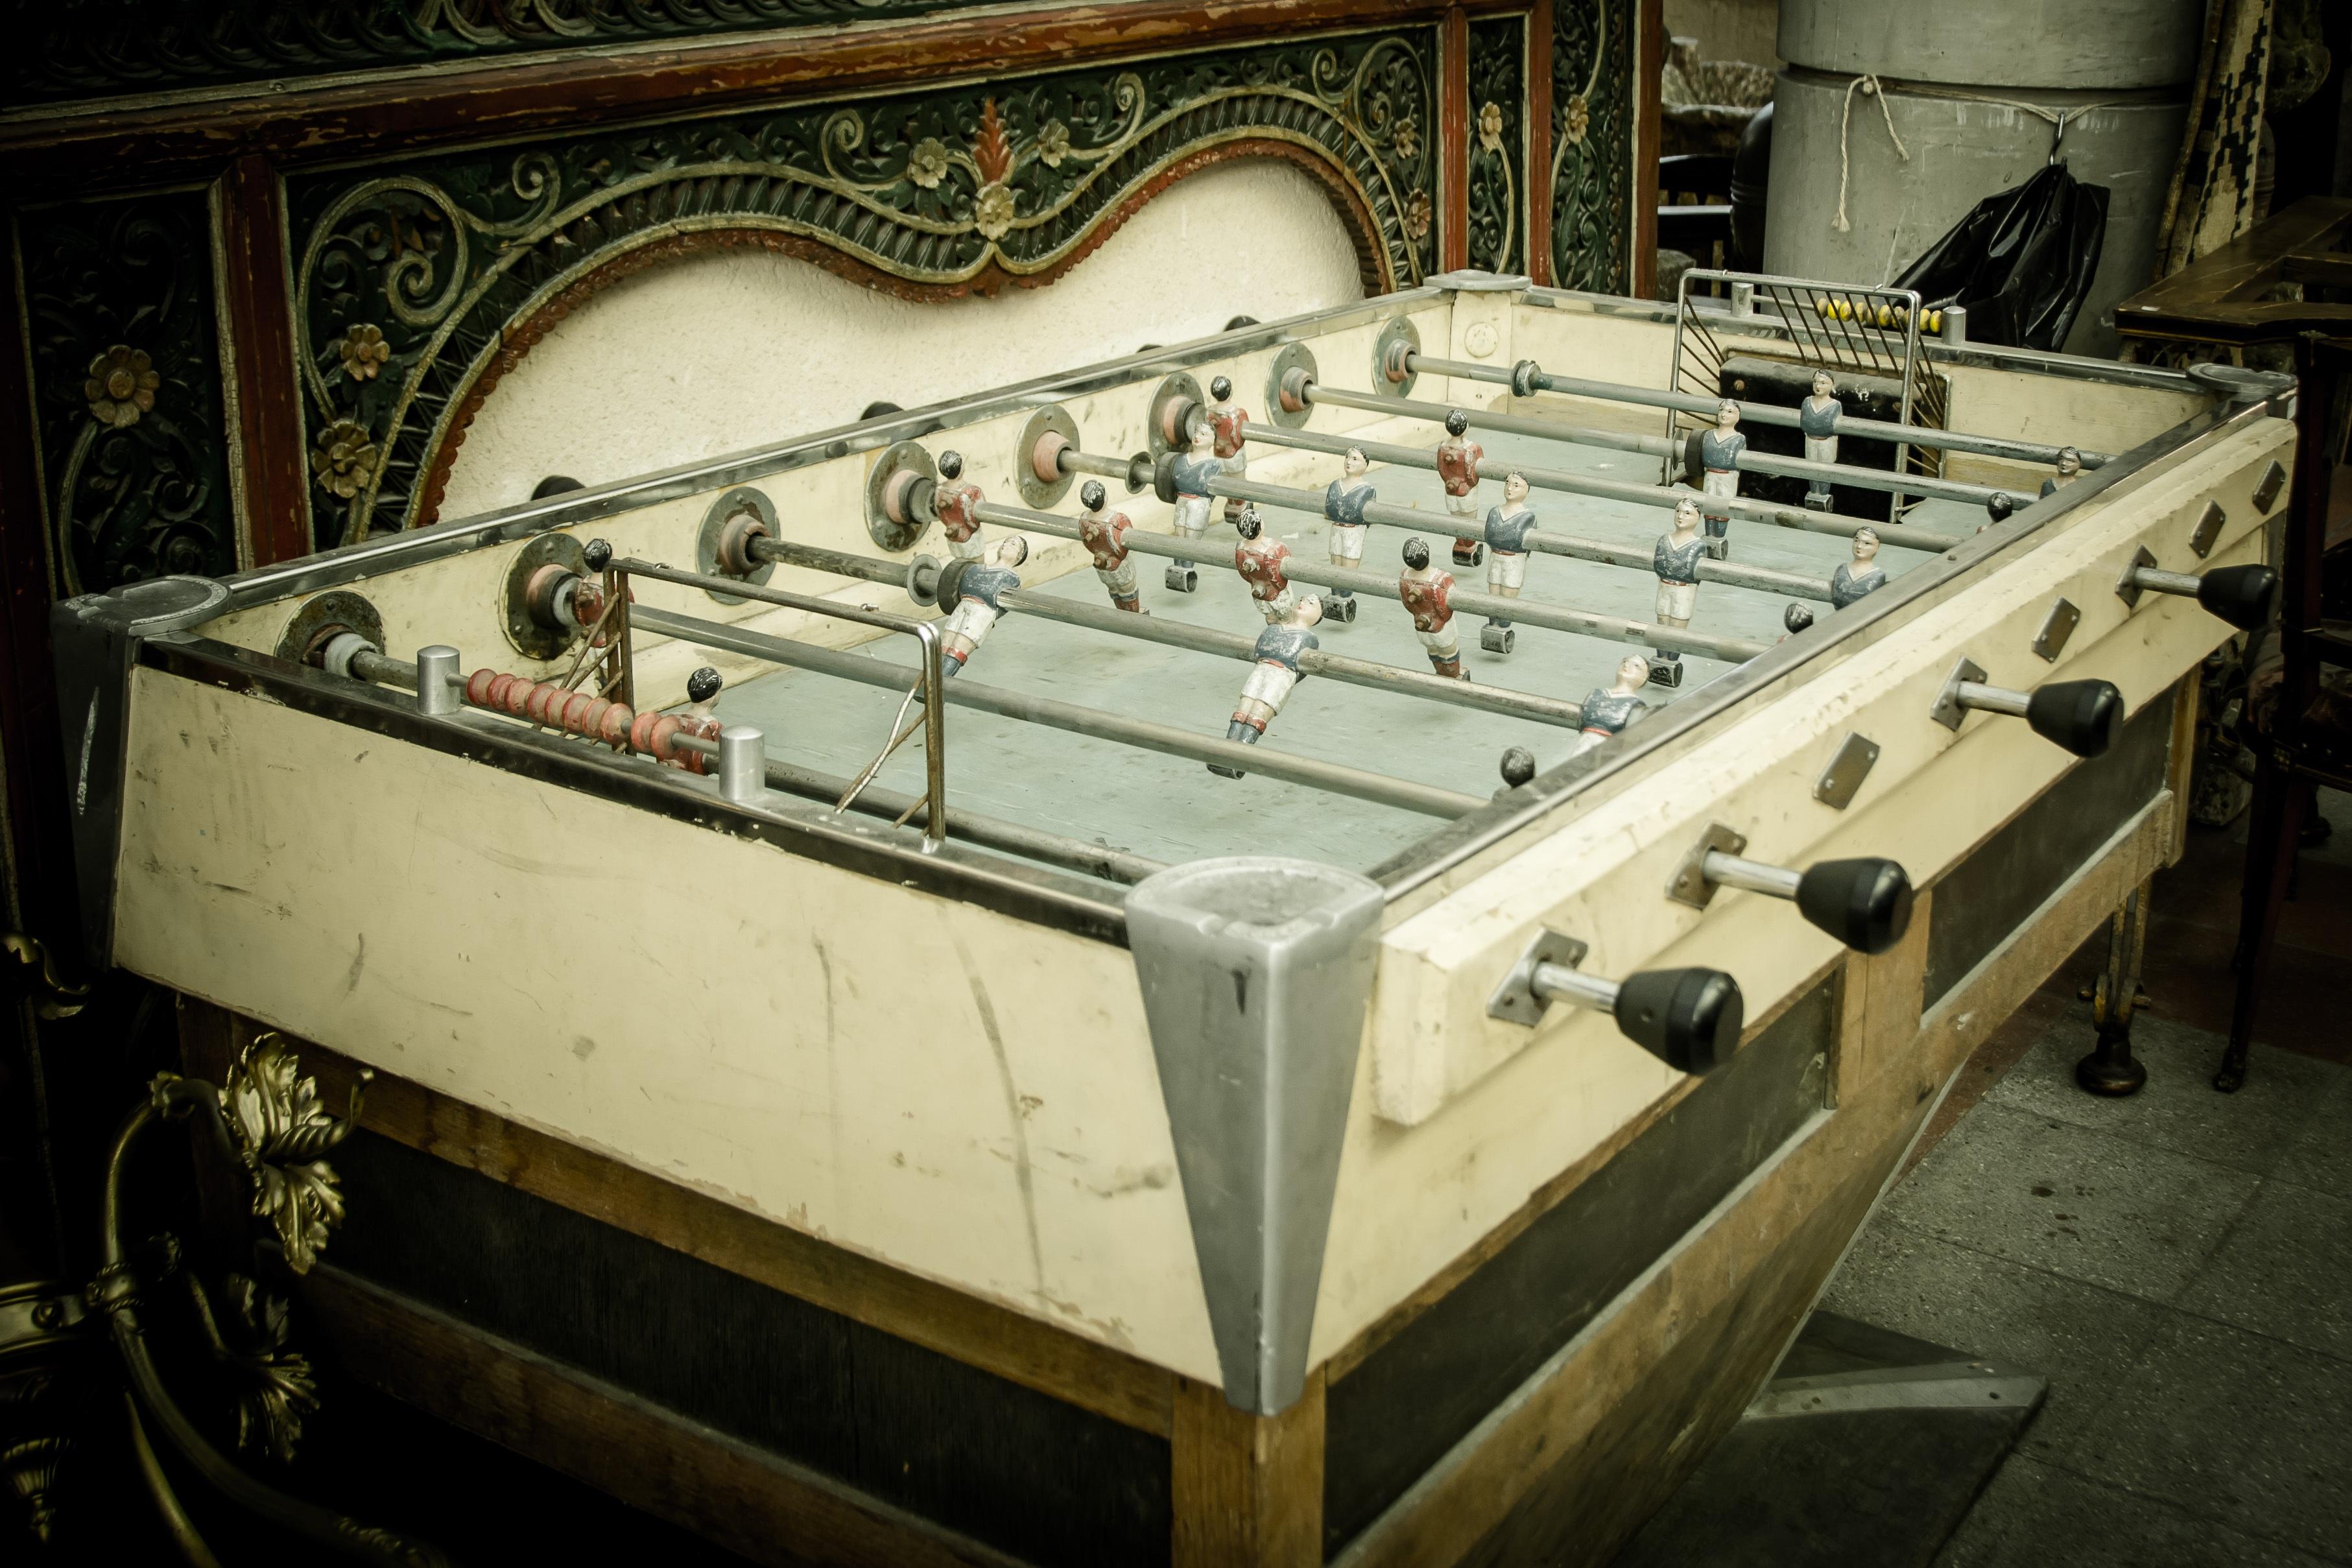 vintage-old-machine-nostalgia-junk-furniture-table-football-flea-market-man-made-object-wuzler-813162 Incroyable De Table Vintage Des Idées